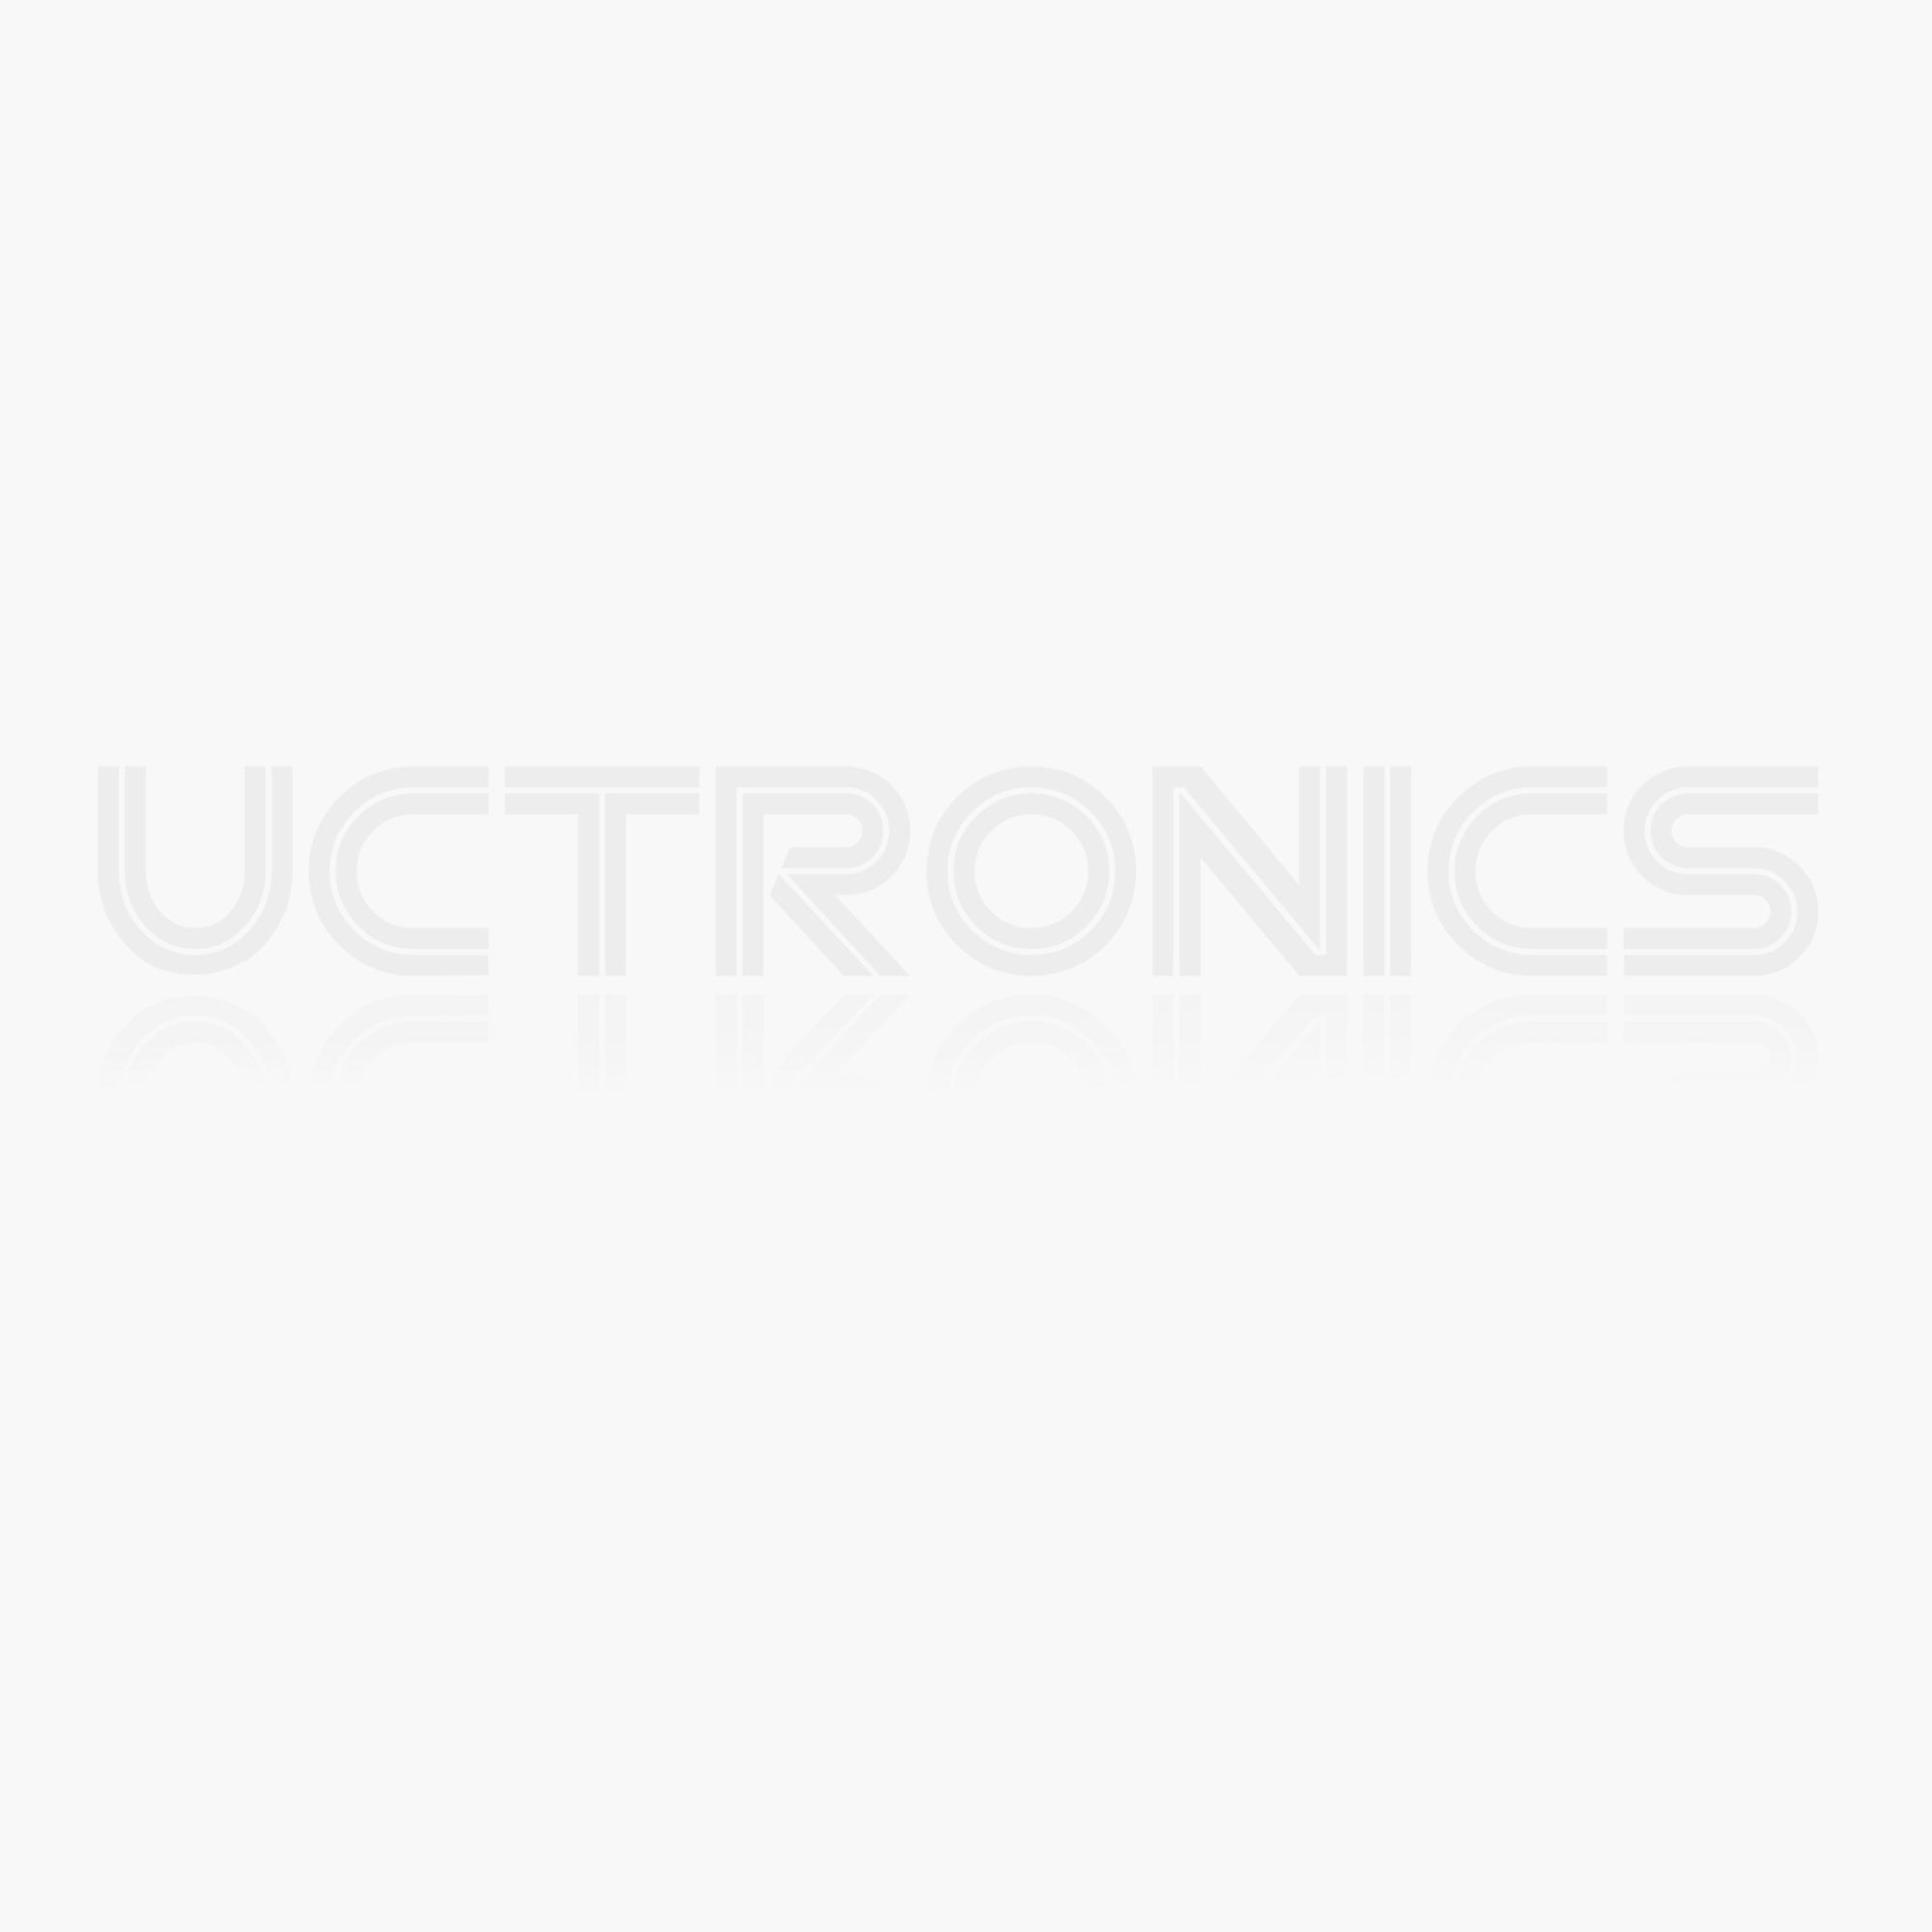 Arducam Complete High Quality Camera Bundle for Raspberry Pi